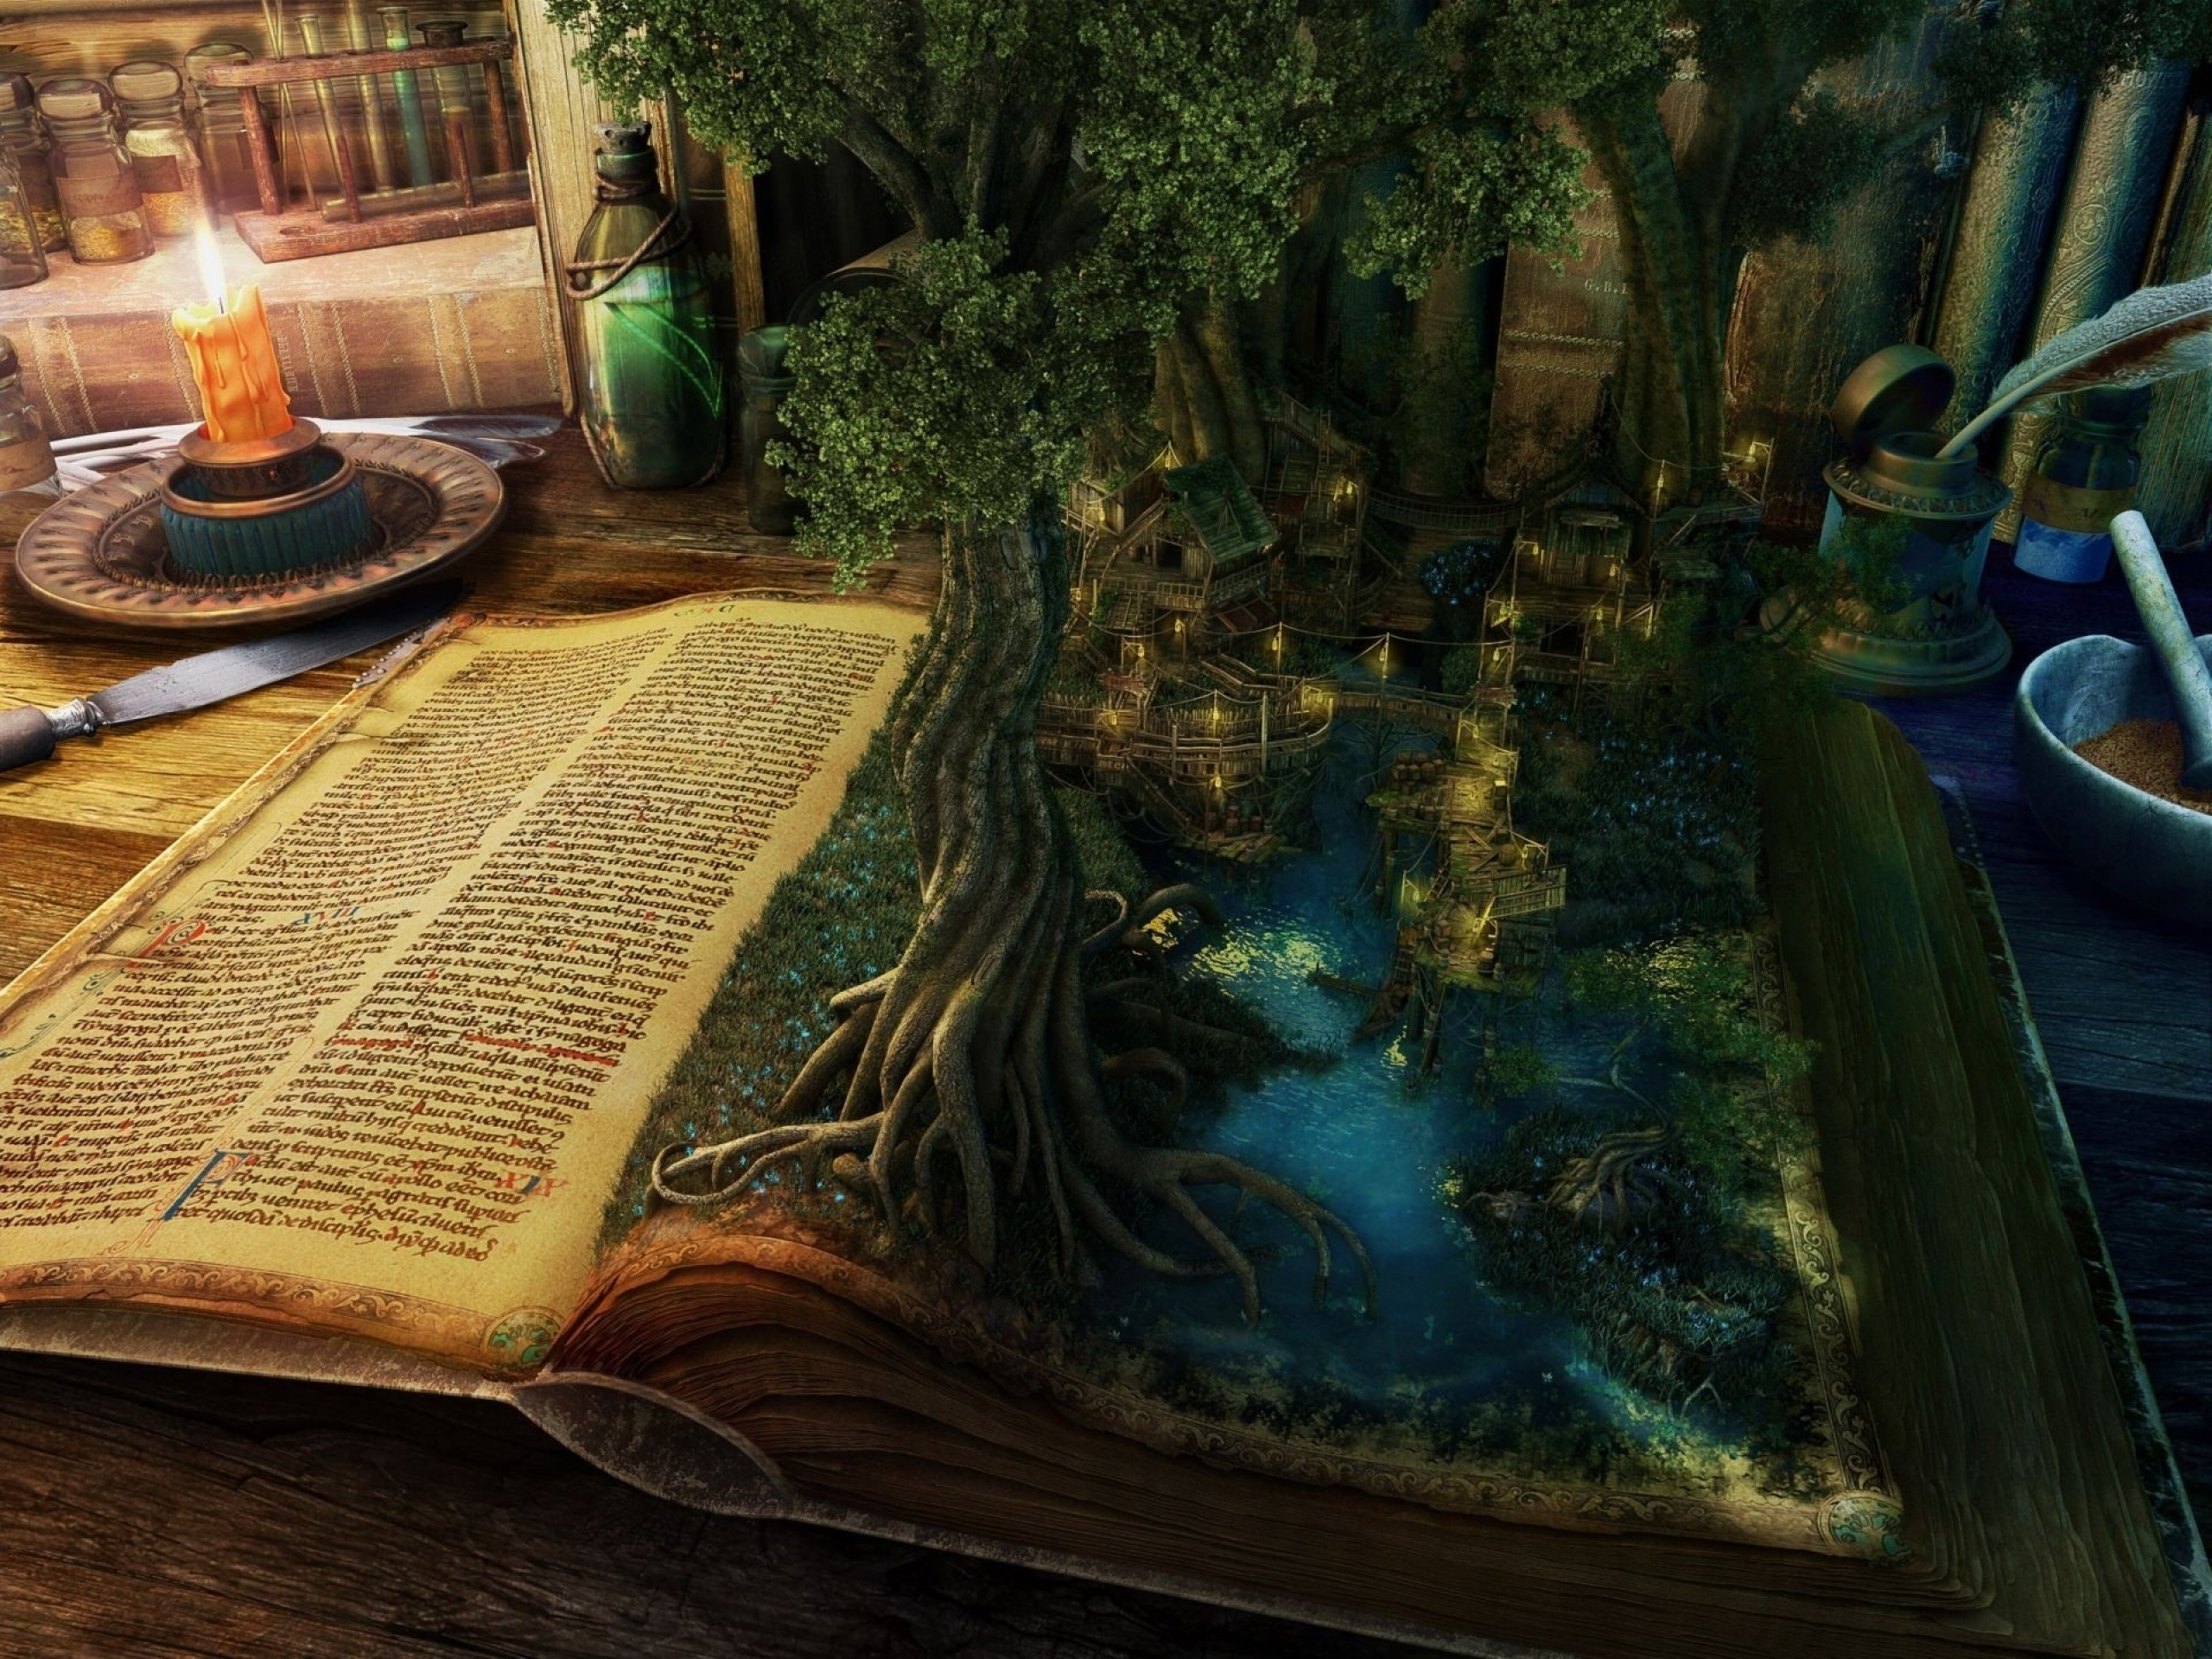 fantasy fantasy art books magic alchemy witchcraft 1920x1440 wallpaper 2560x1920